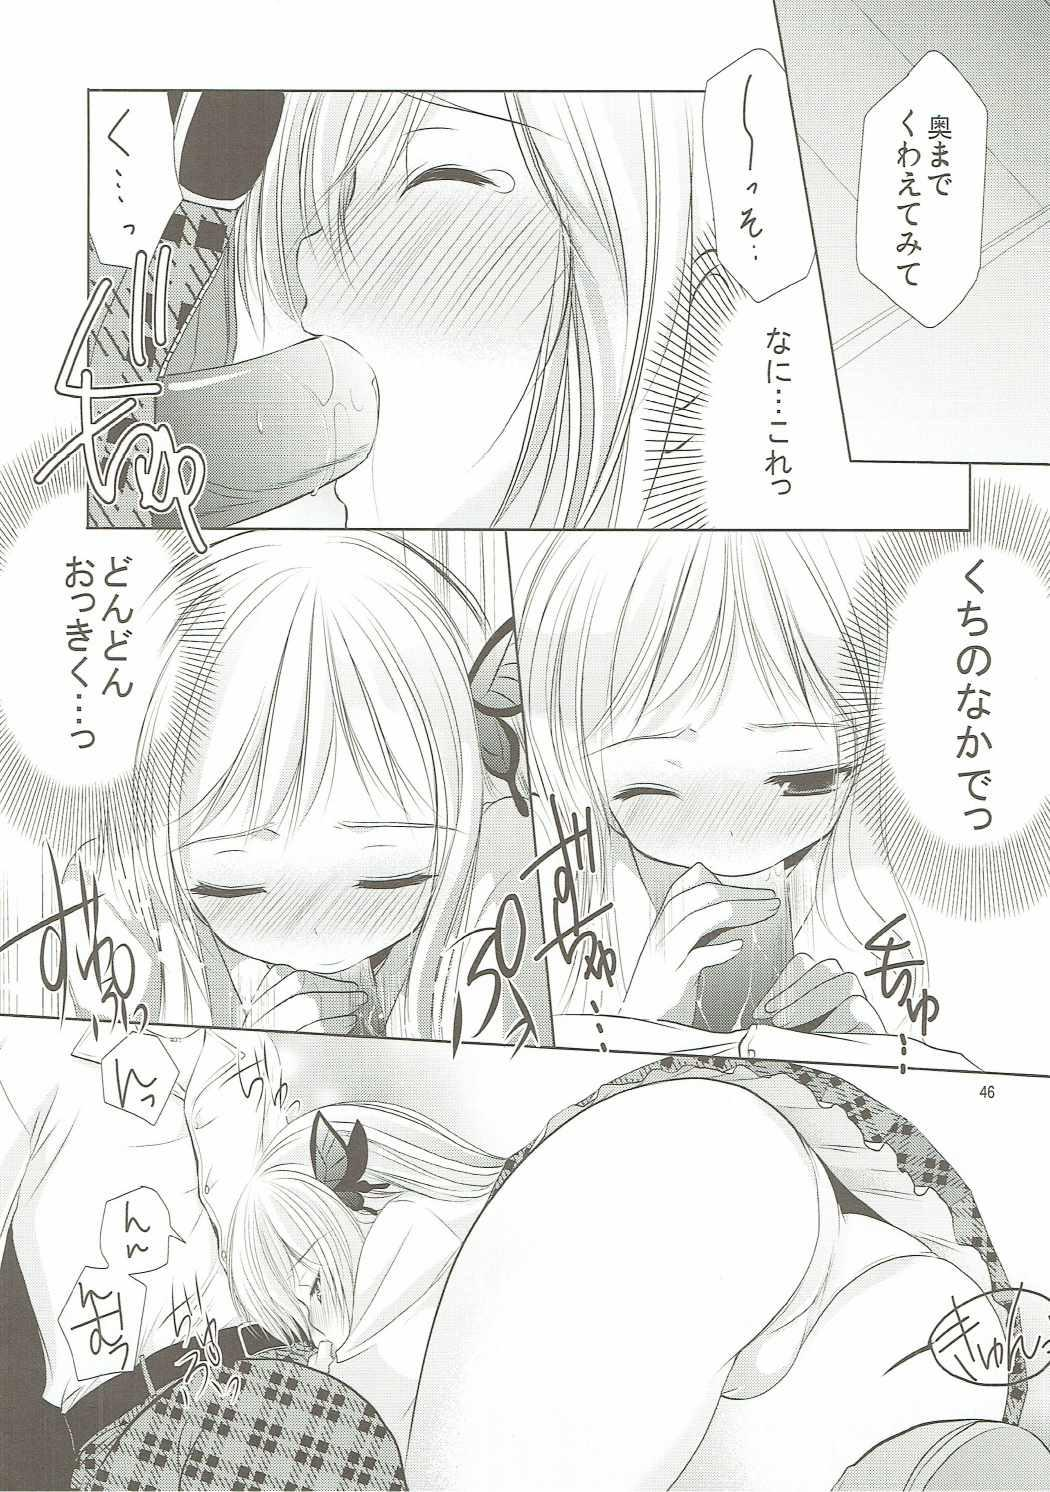 ANIME COLLECTION Imomuya Honpo - Singleton Anime Soushuuhen 44